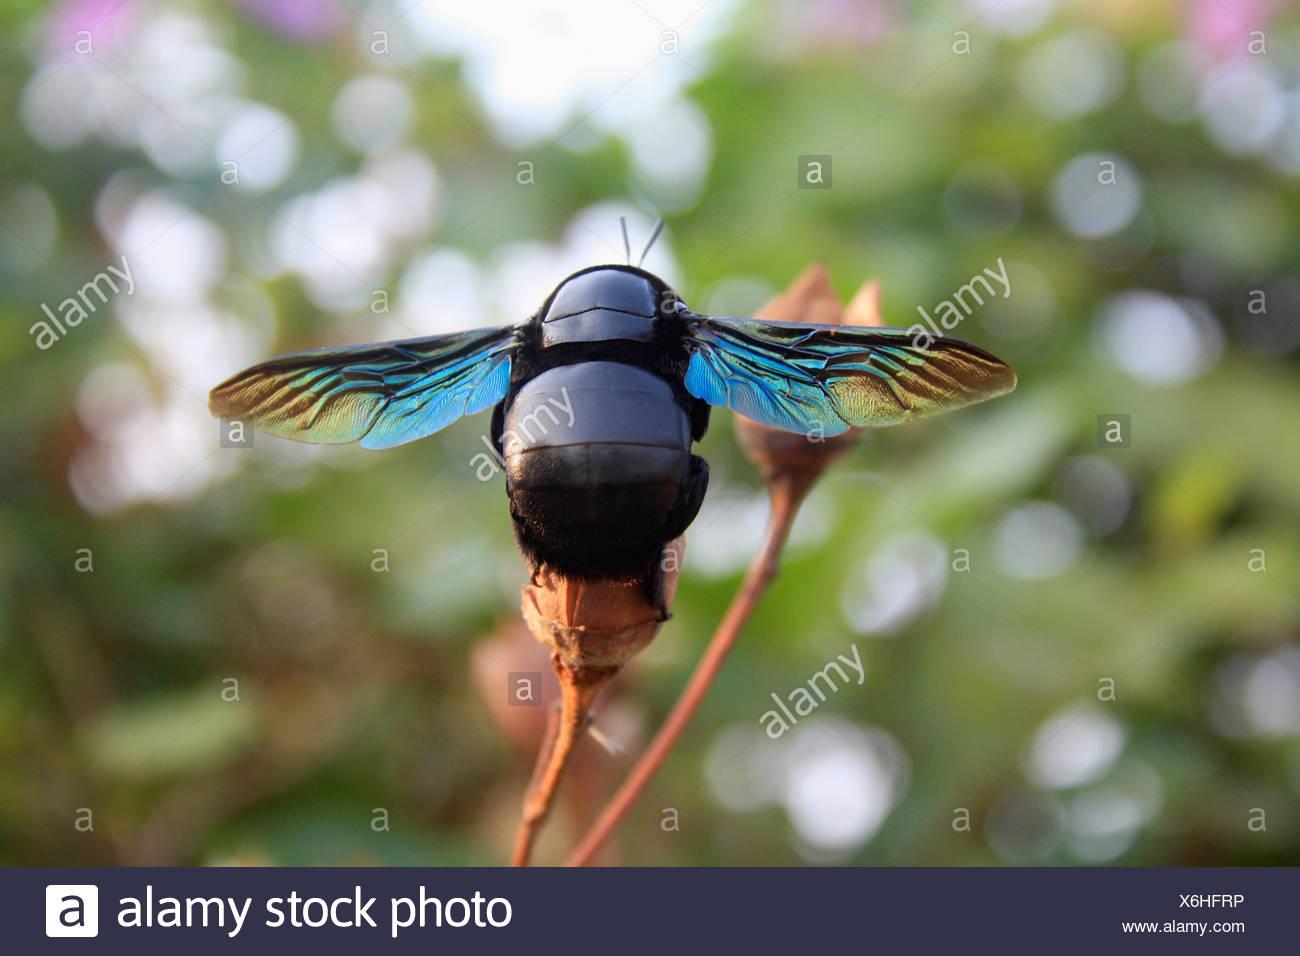 Carpenter Bee, Aarey Milk Colony, Mumbai, India - Stock Image